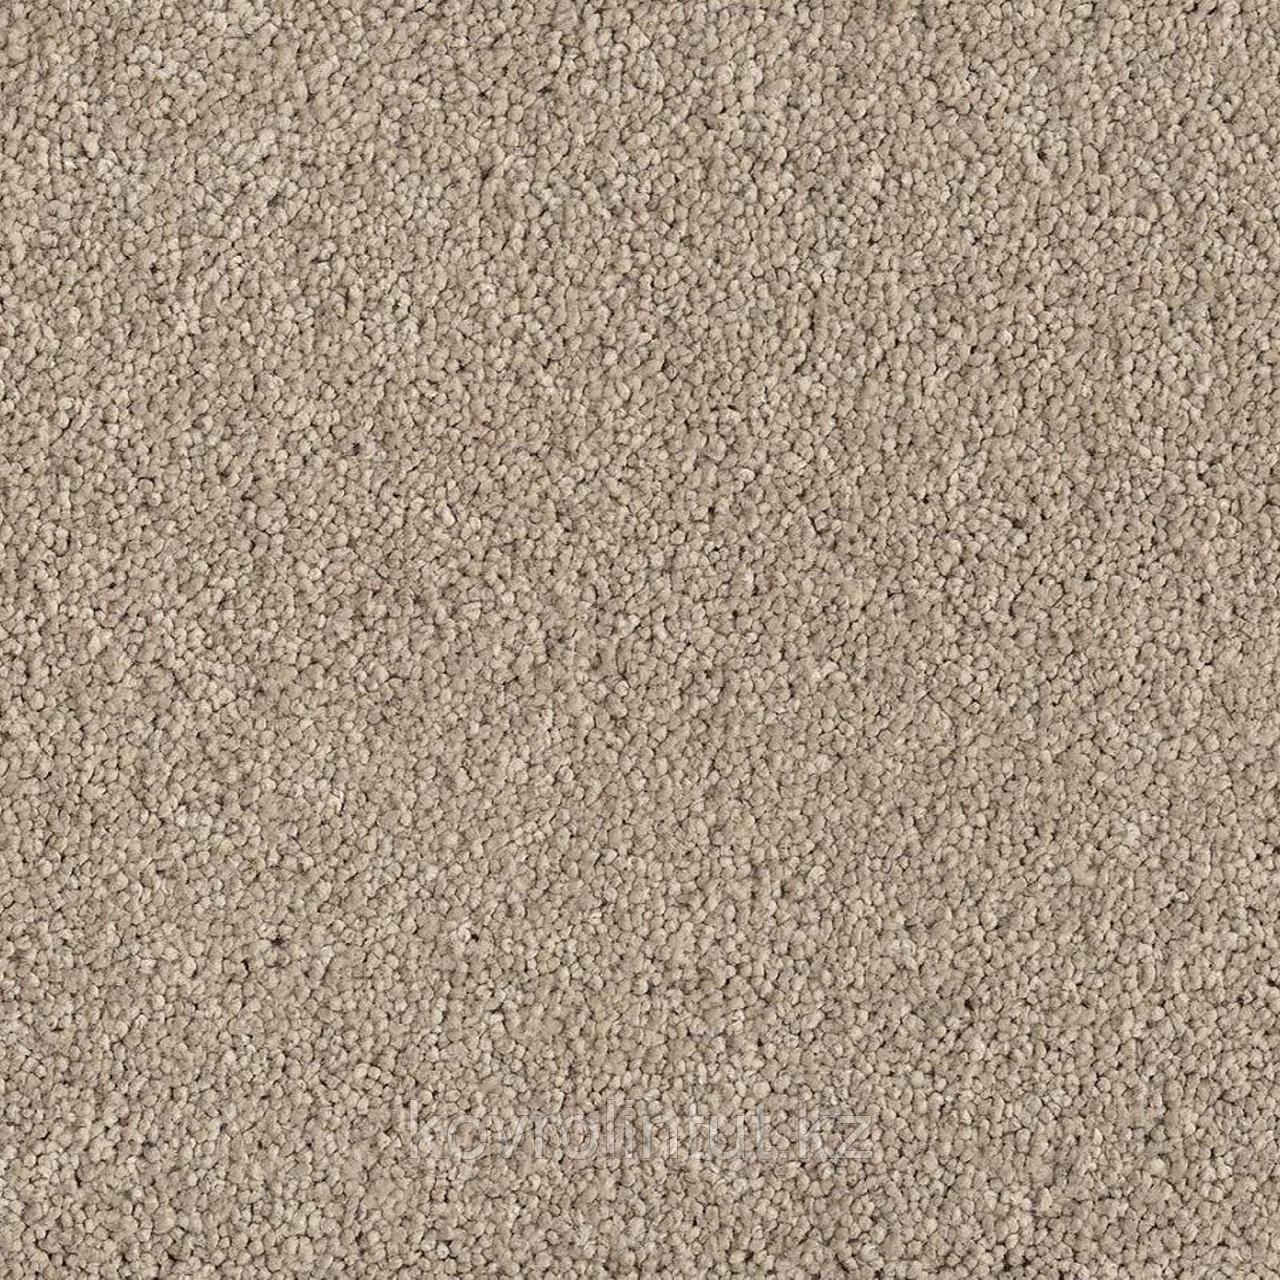 Покрытие ковровое AW Punch 34, 4 м, 100 % SDN